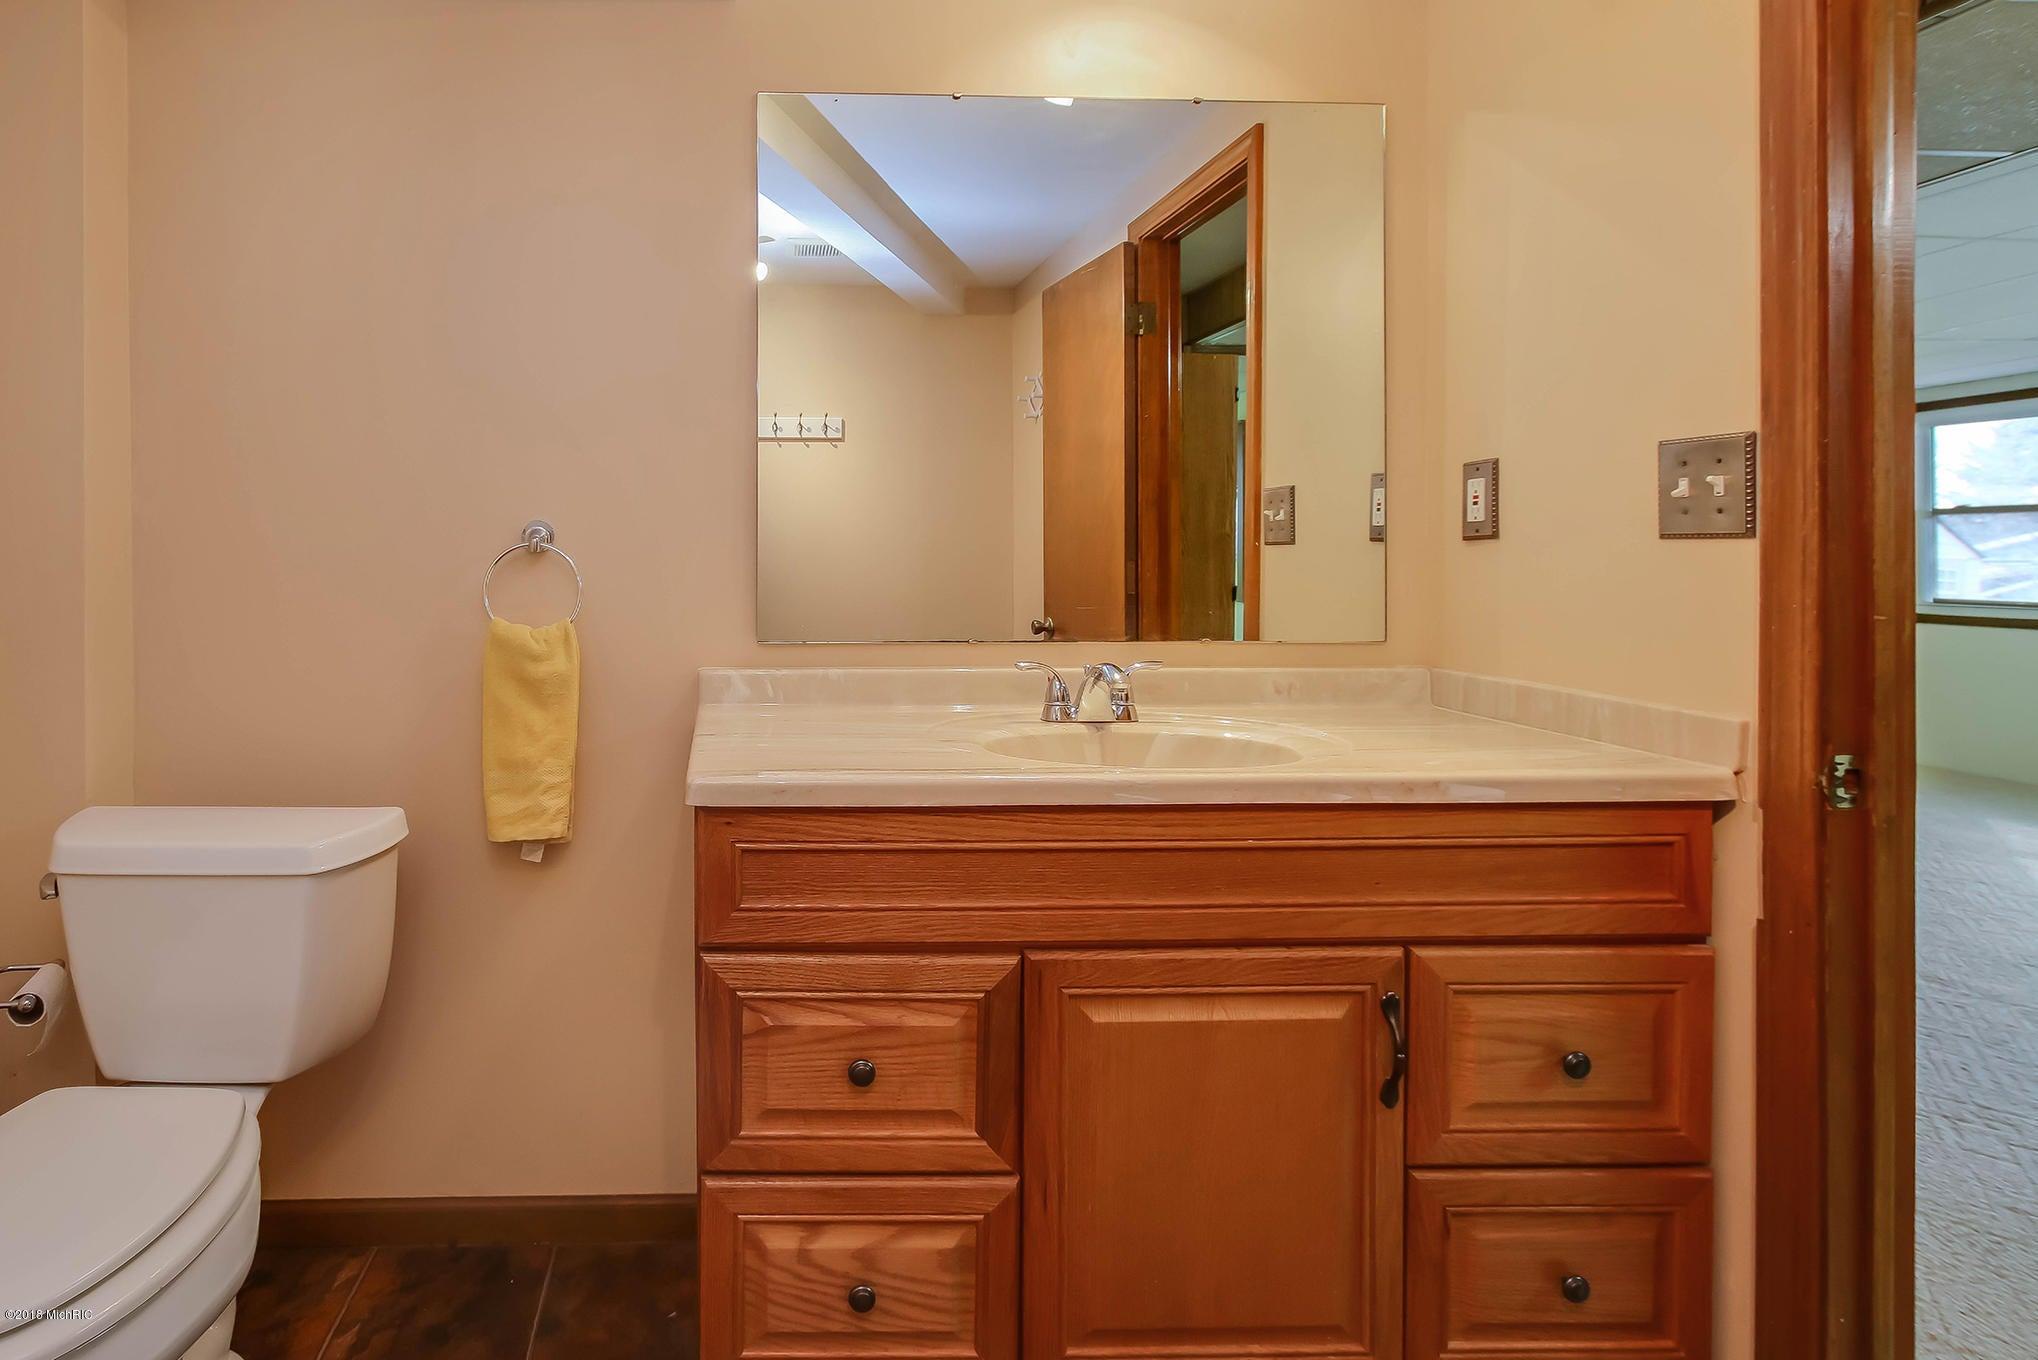 7157 eastern avenue se grand rapids mi 49508 sold for Bathroom design grand rapids mi